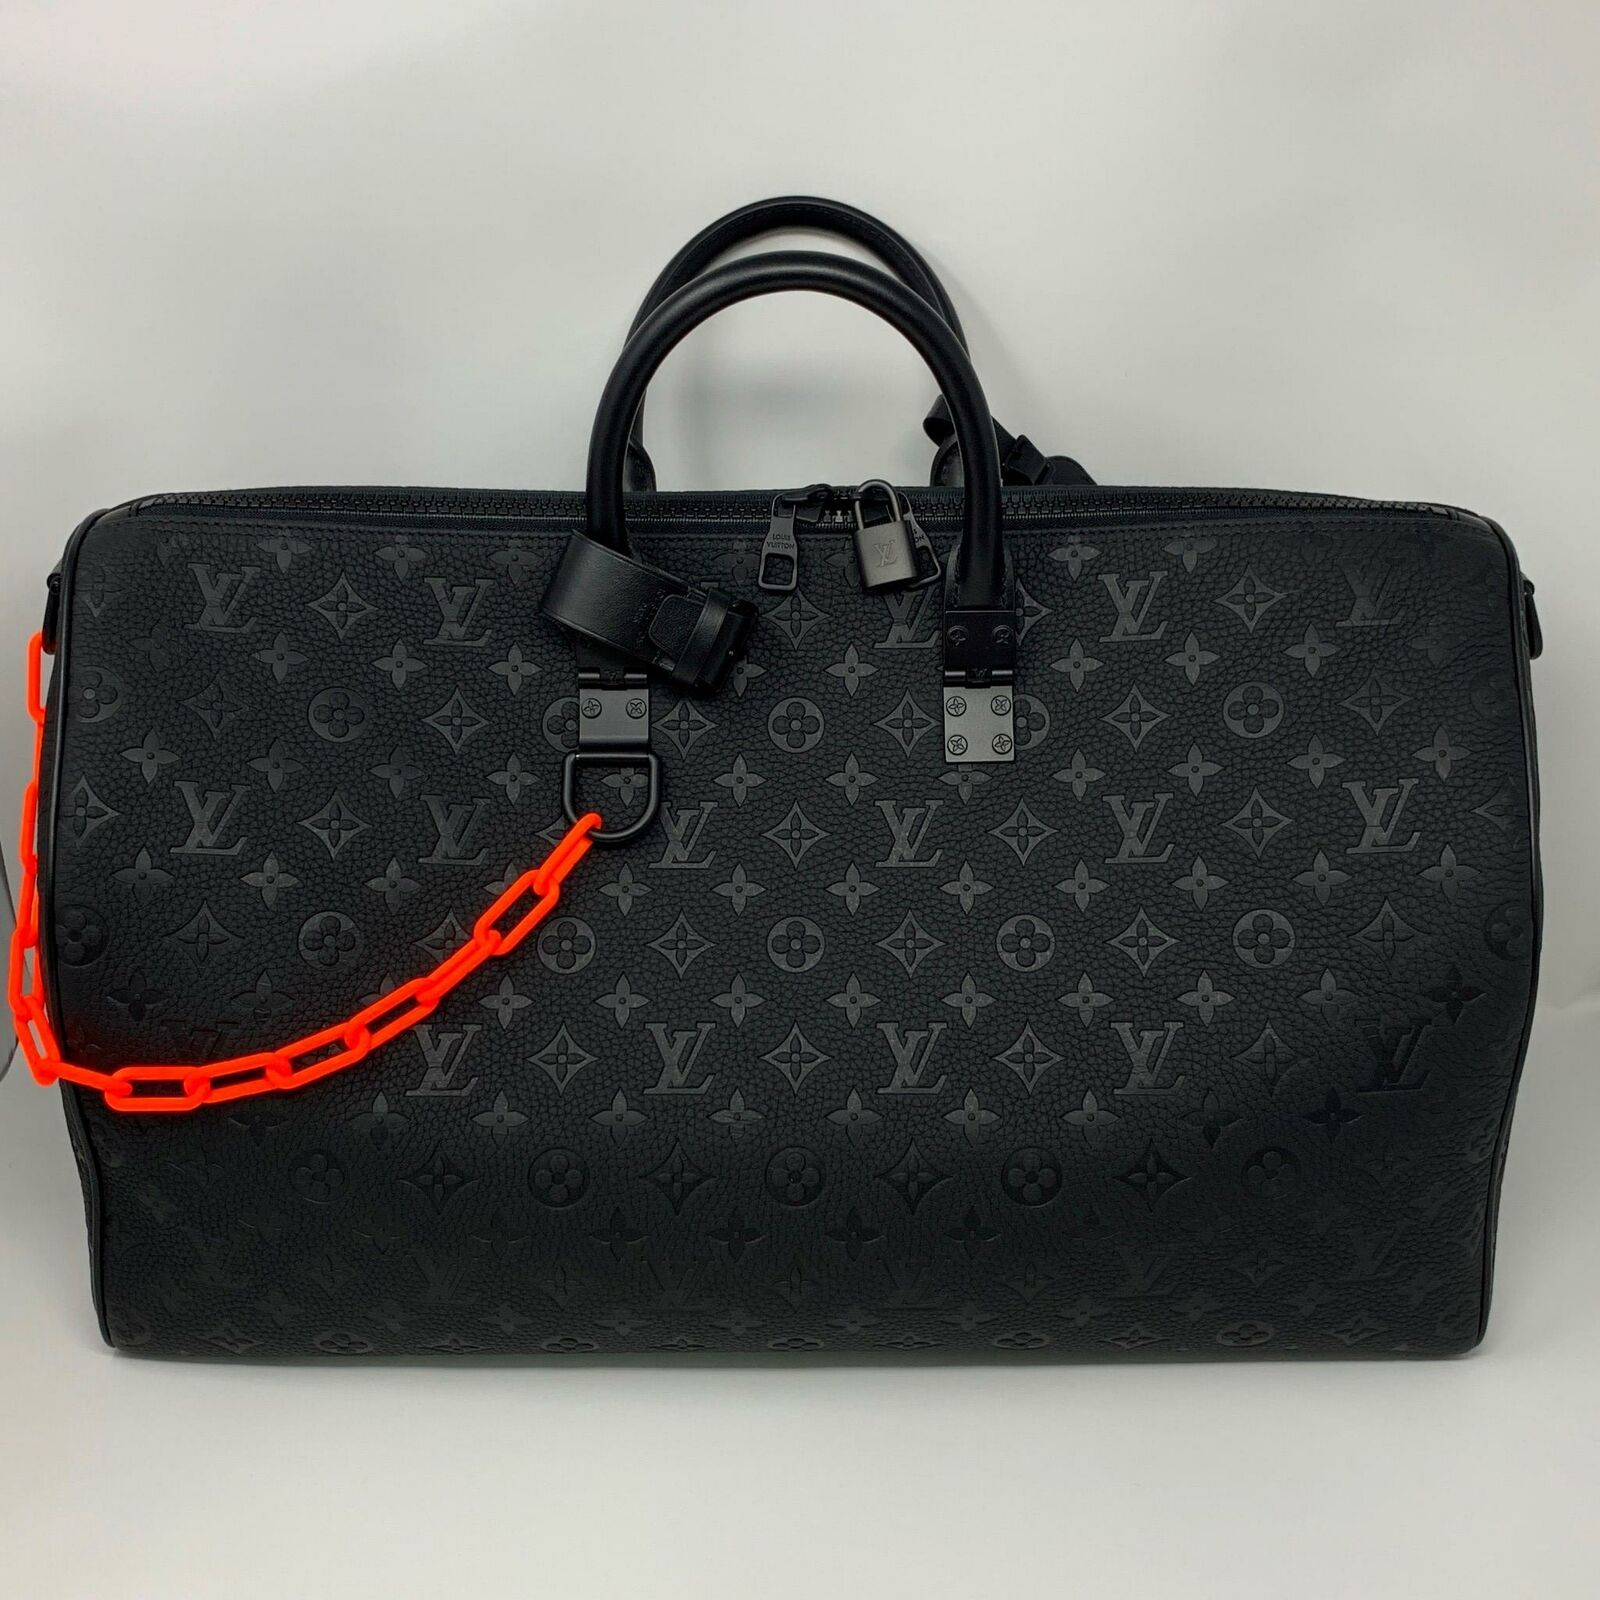 ca437b2618 Louis Vuitton x Virgil Abloh Keepall BLACK Taurillion embossed ...